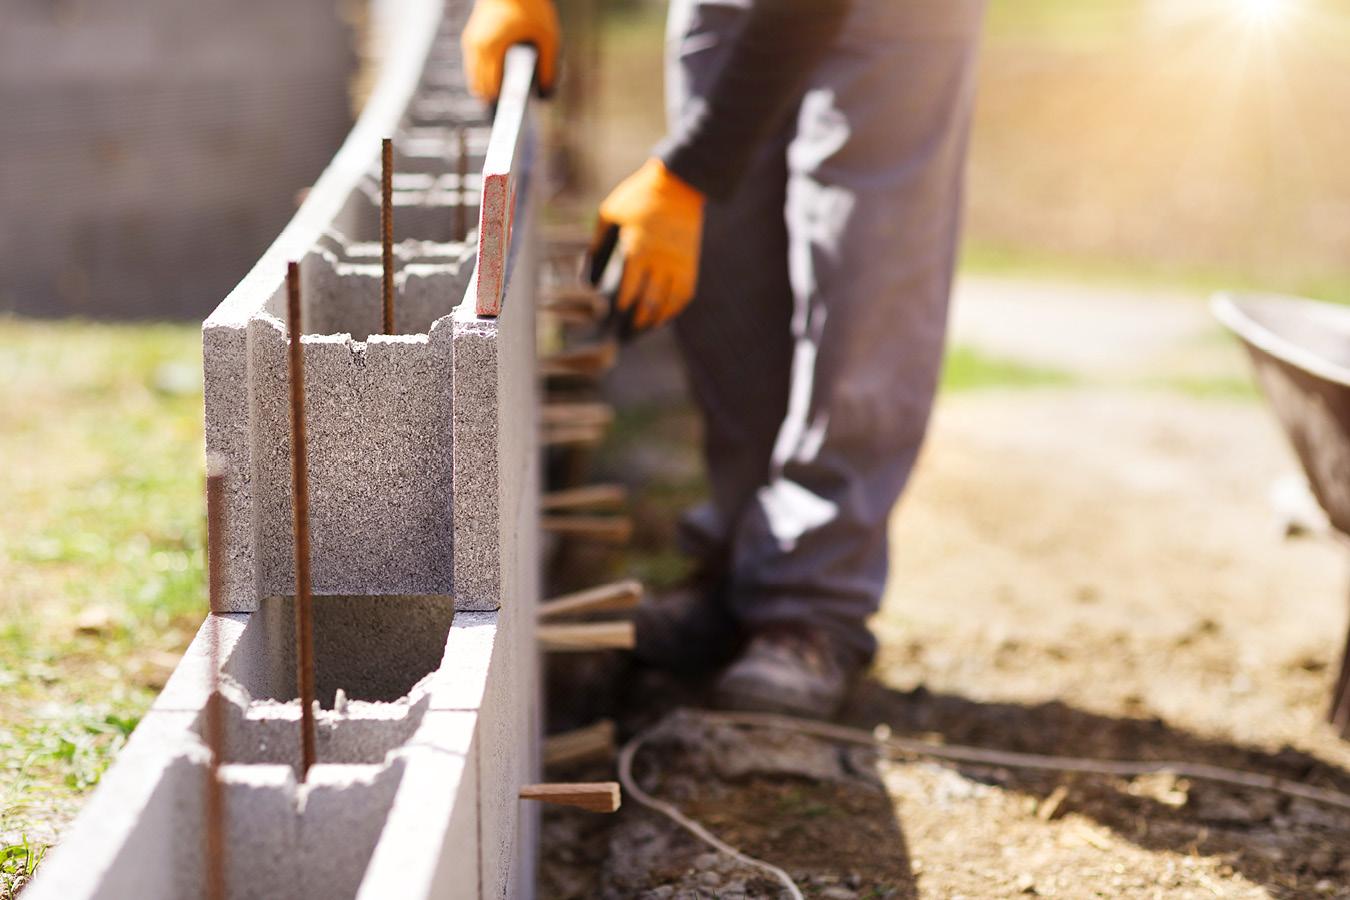 Skilled trades construction brick laying